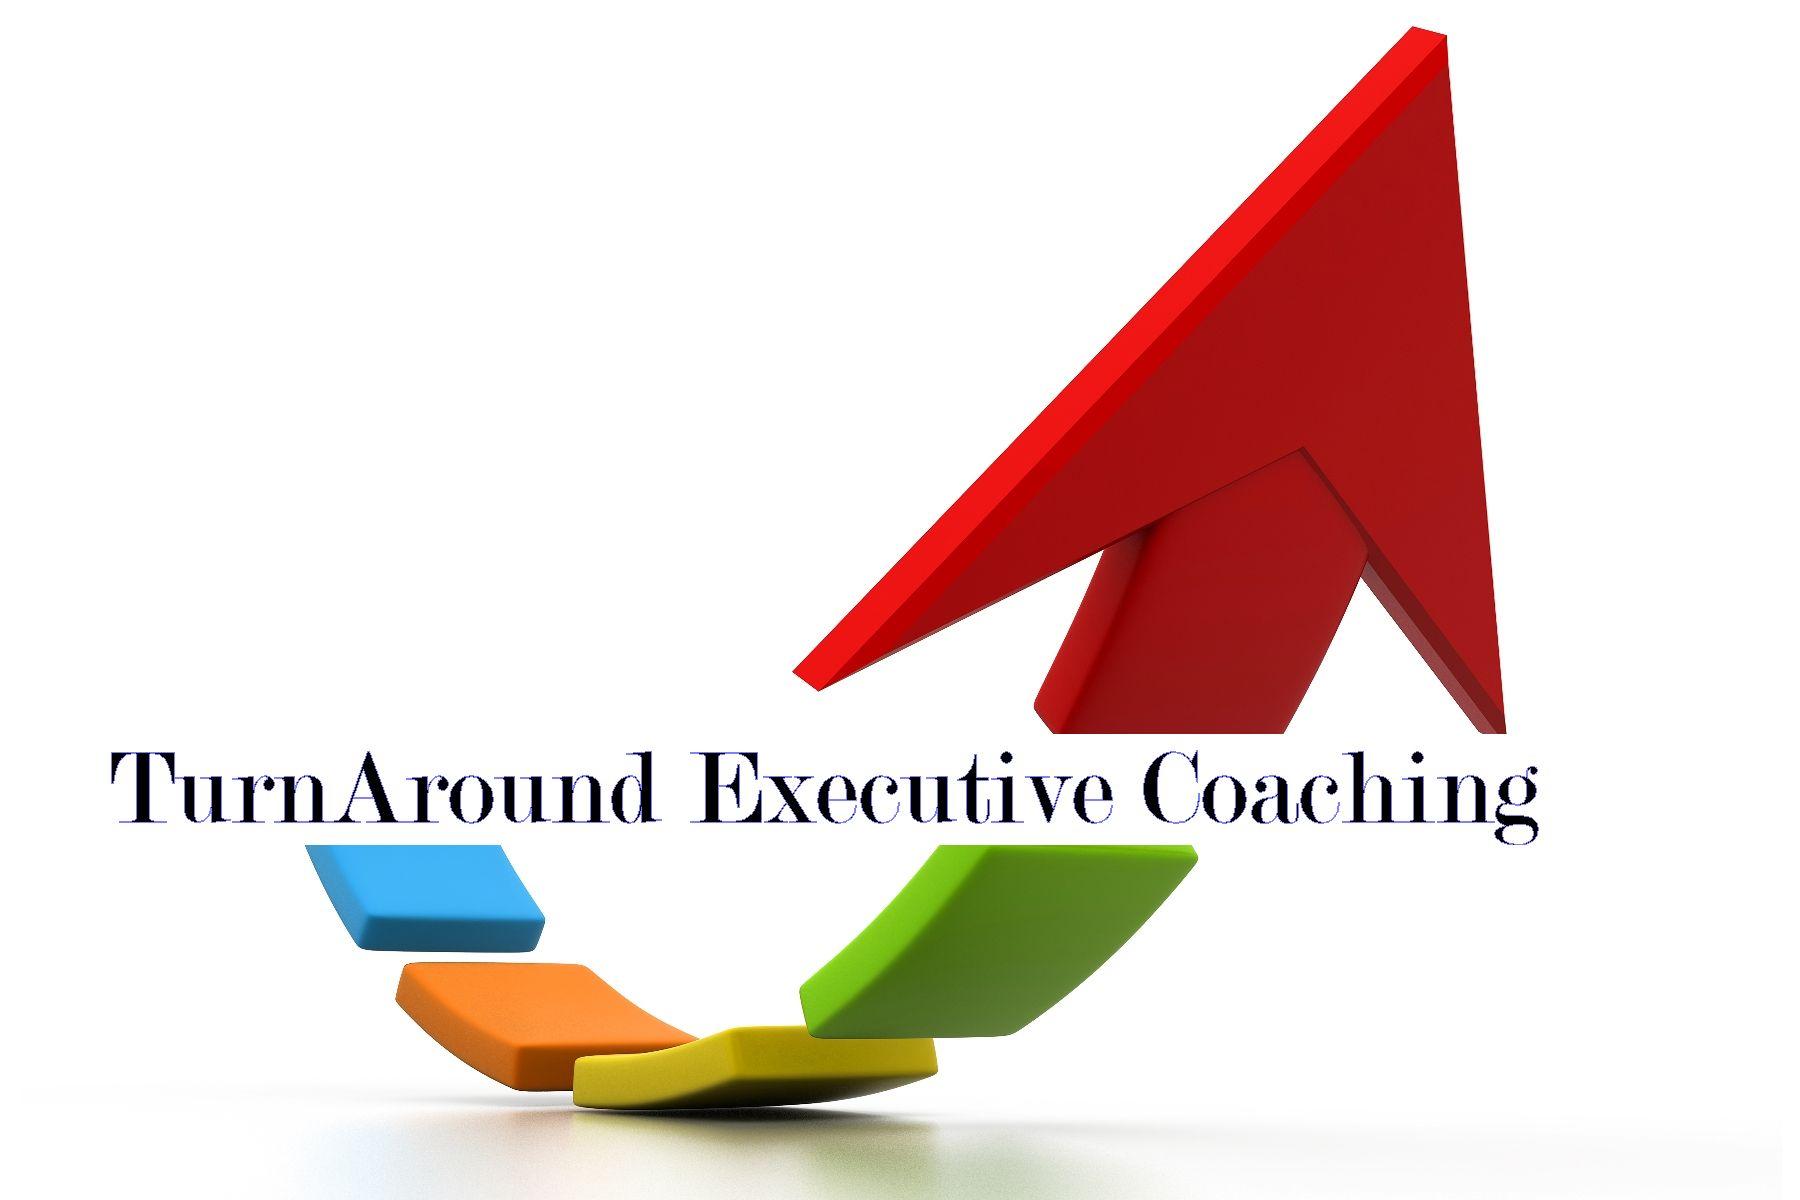 TurnAround Executive Coaching